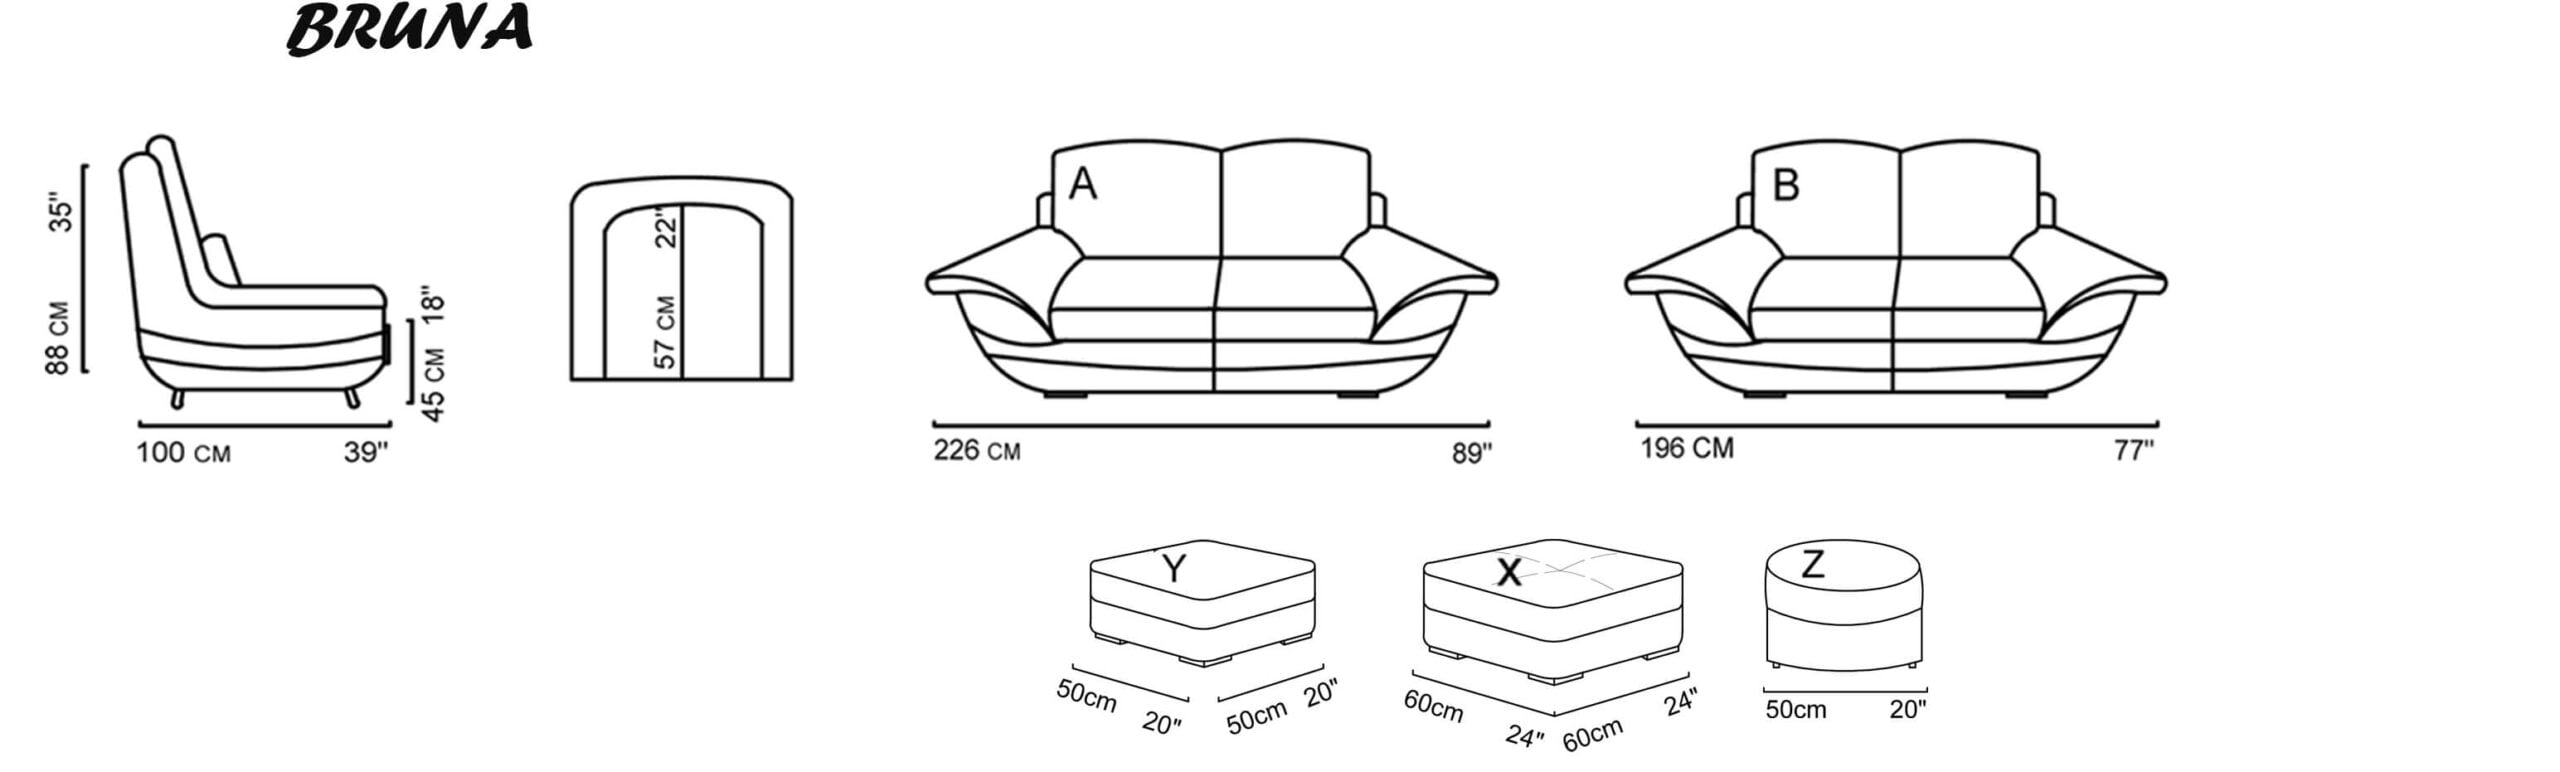 bruna sofa giotto living sofa relax sofa ange sofa sofabed